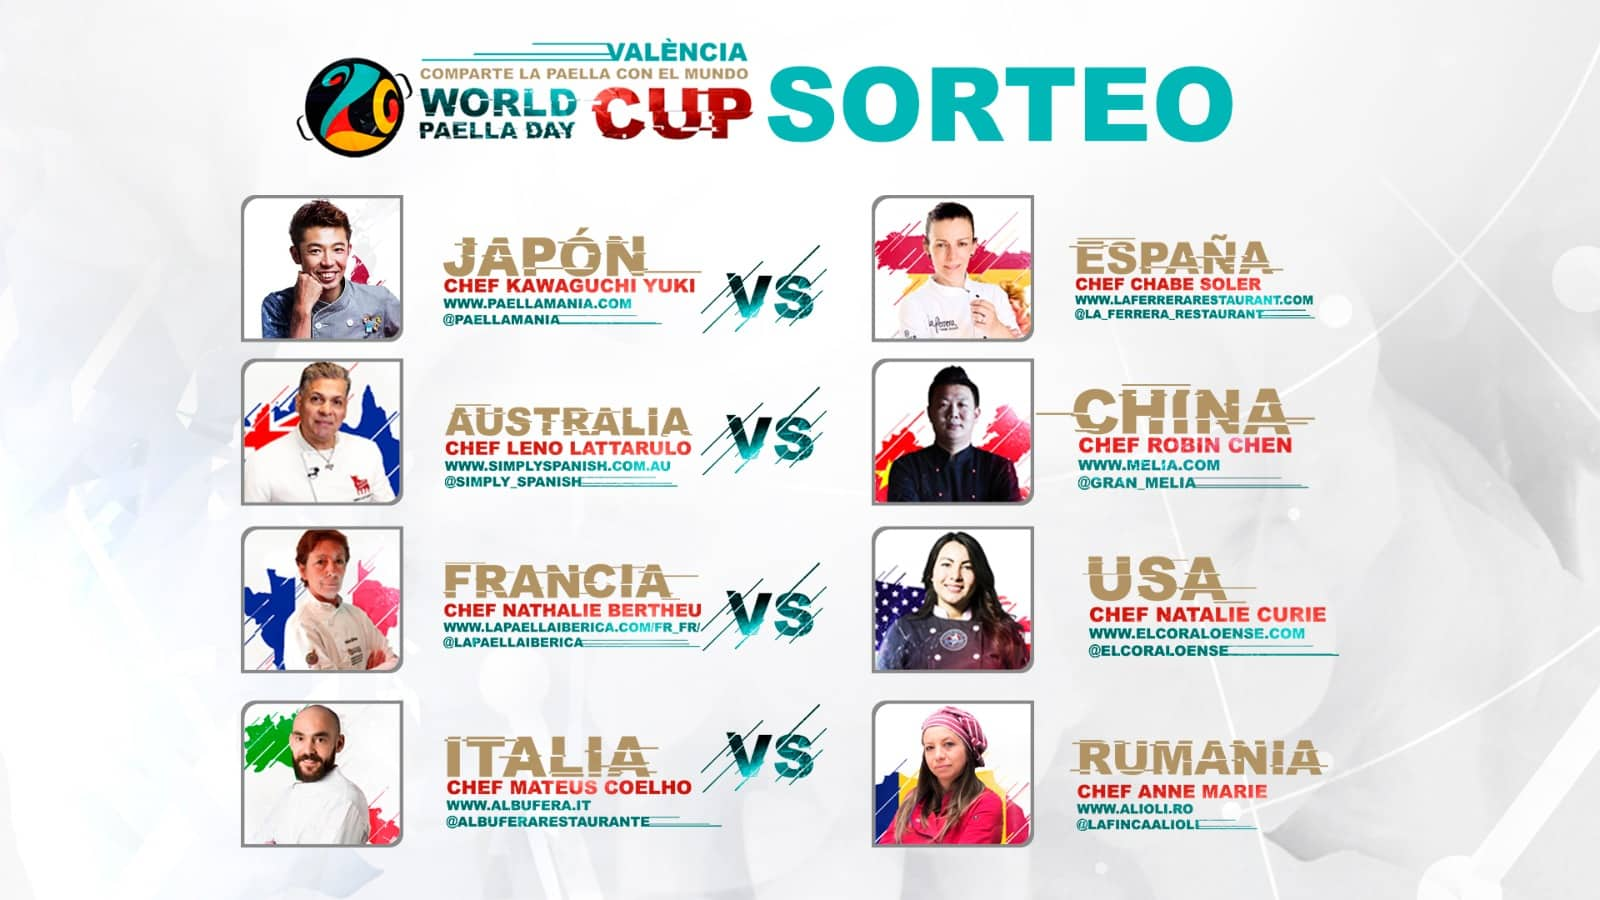 World Paella Cup